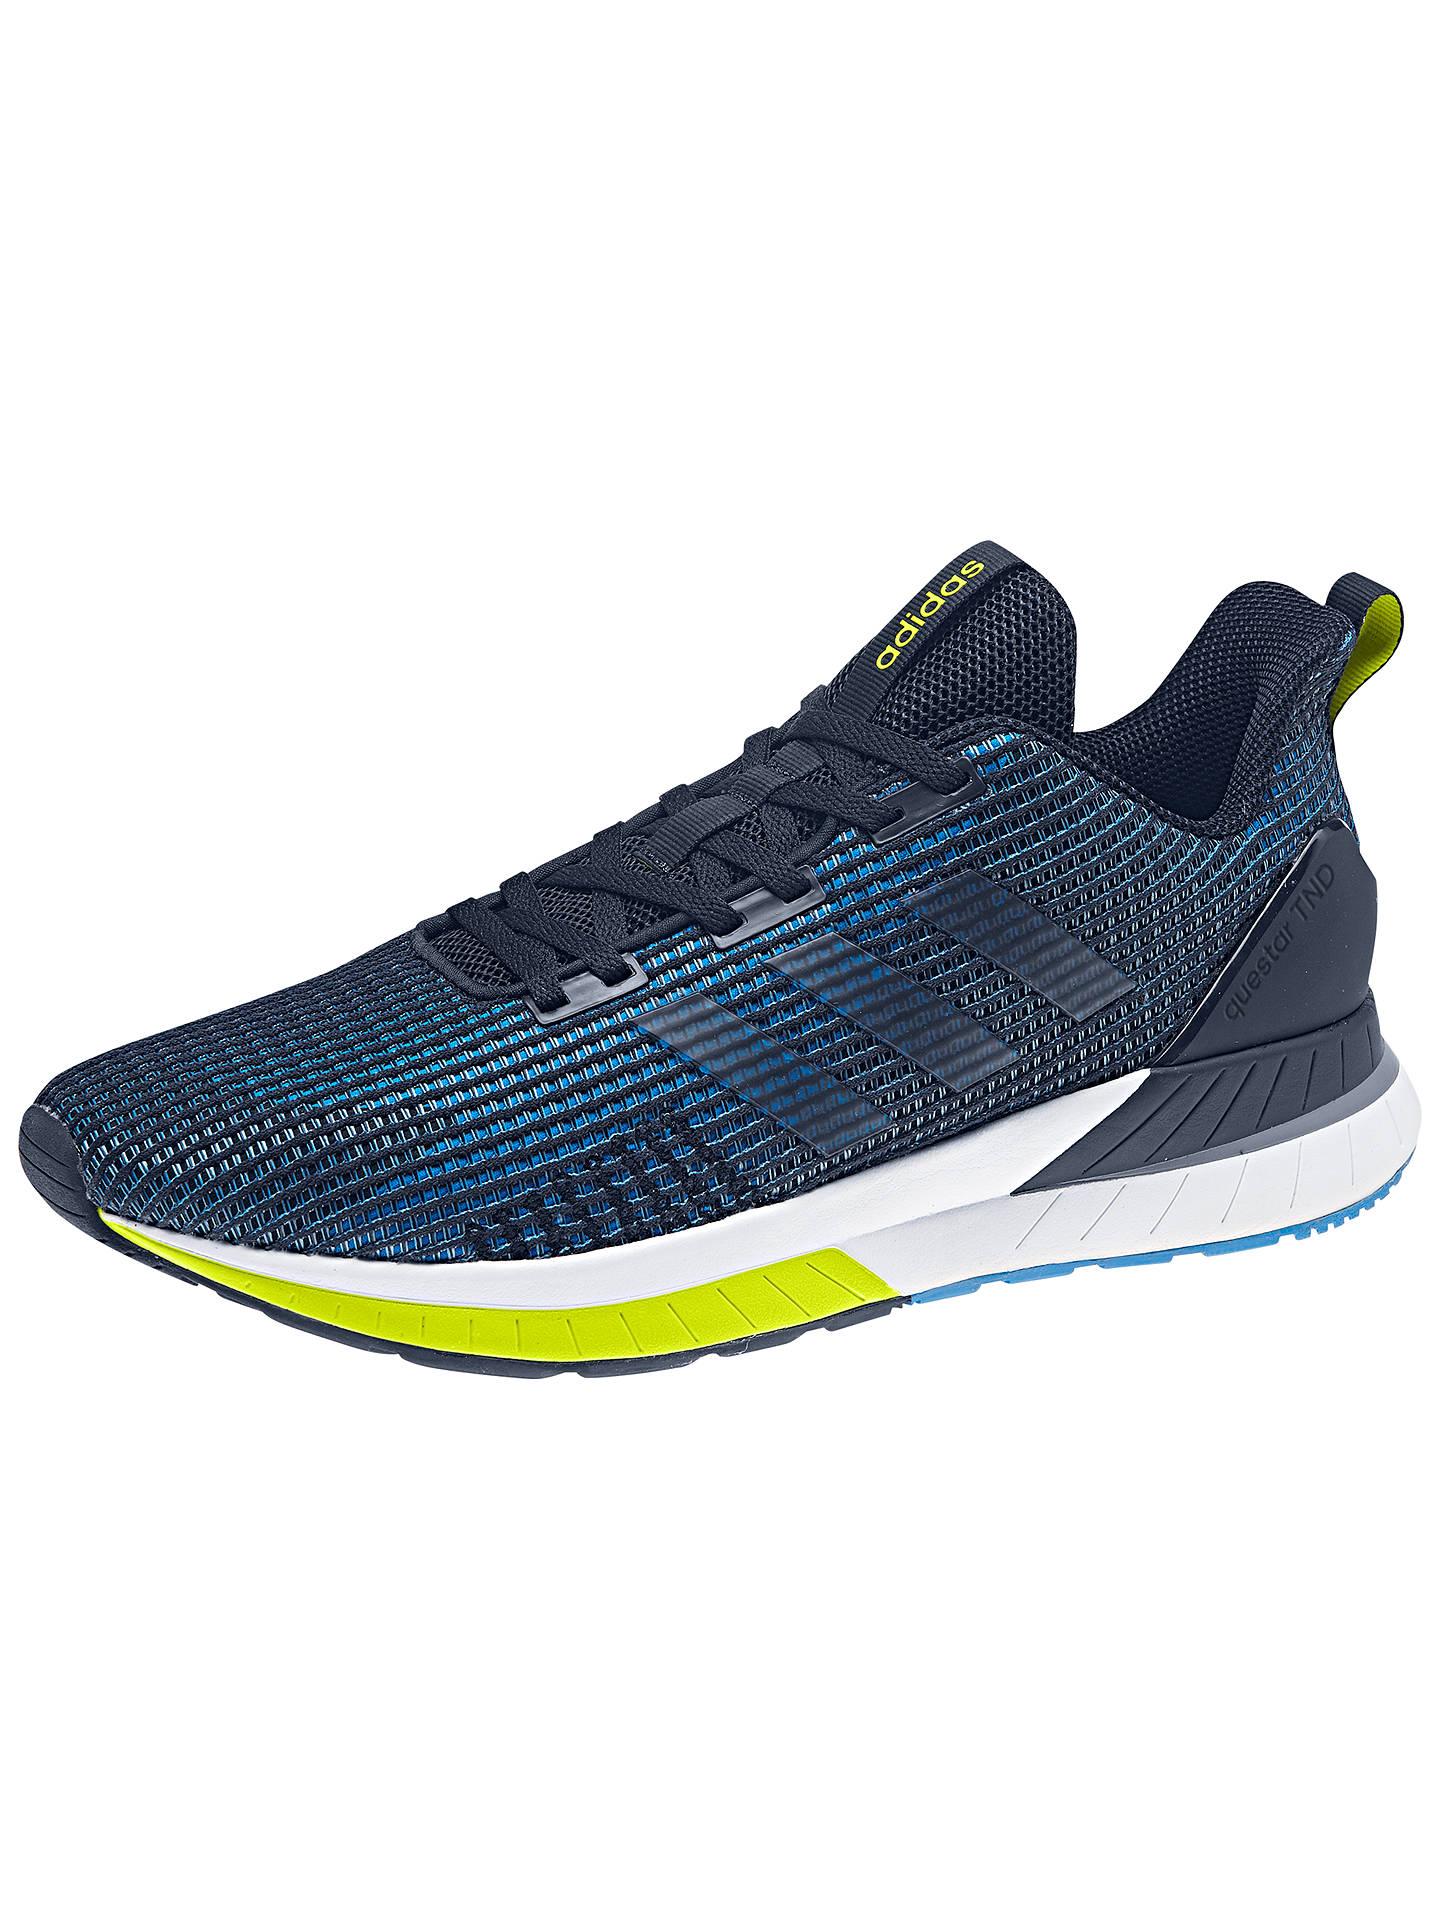 adidas Questar TND Men's Running Shoes, Collegiate Navy at